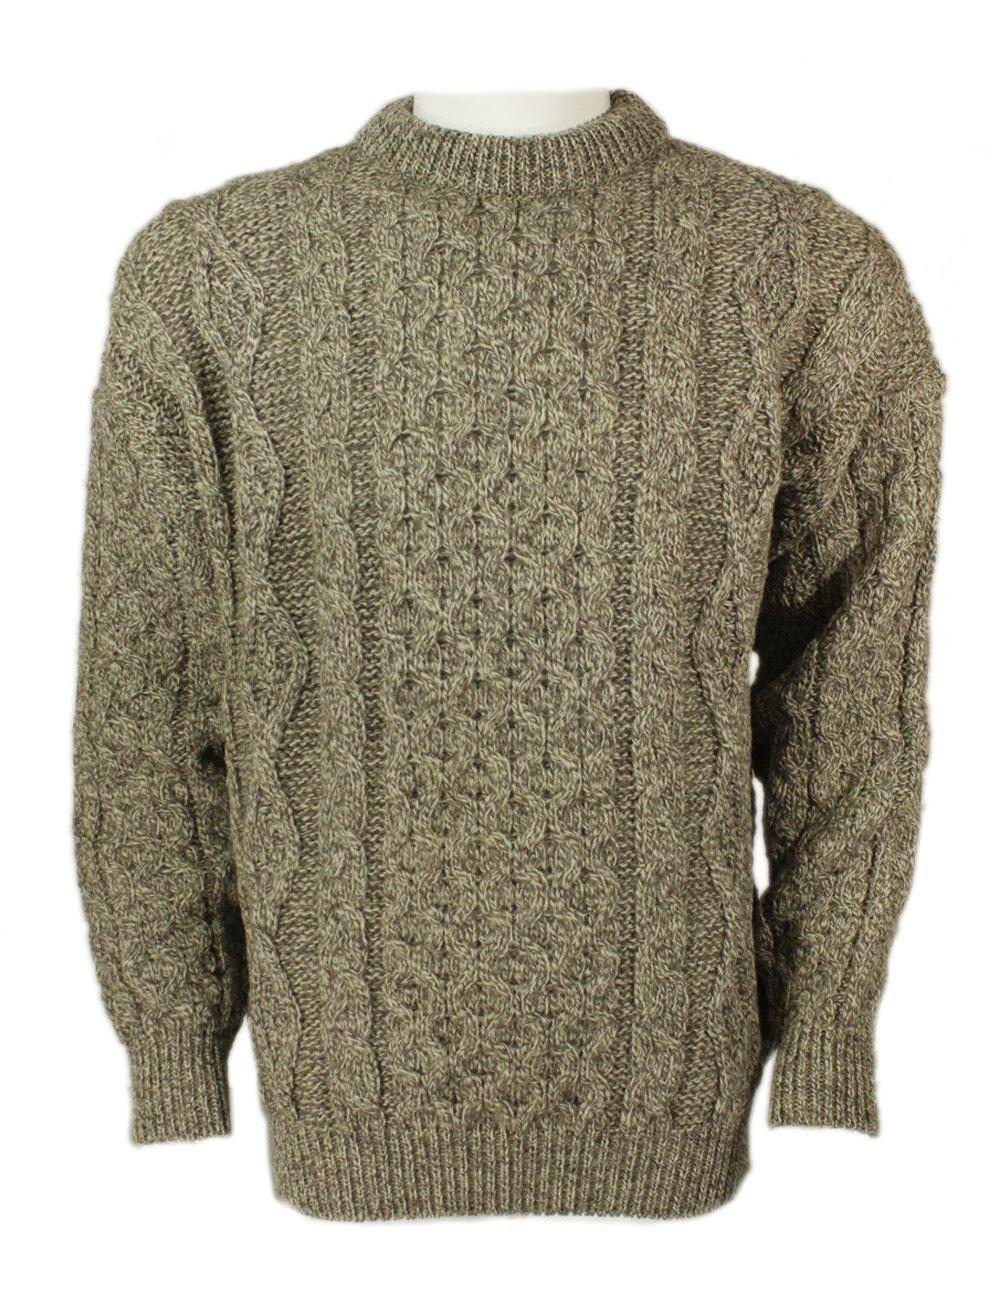 Kerry Woollen Mills ST. Patrick's Day Aran Sweater 100% Wool Irish Made Unisex